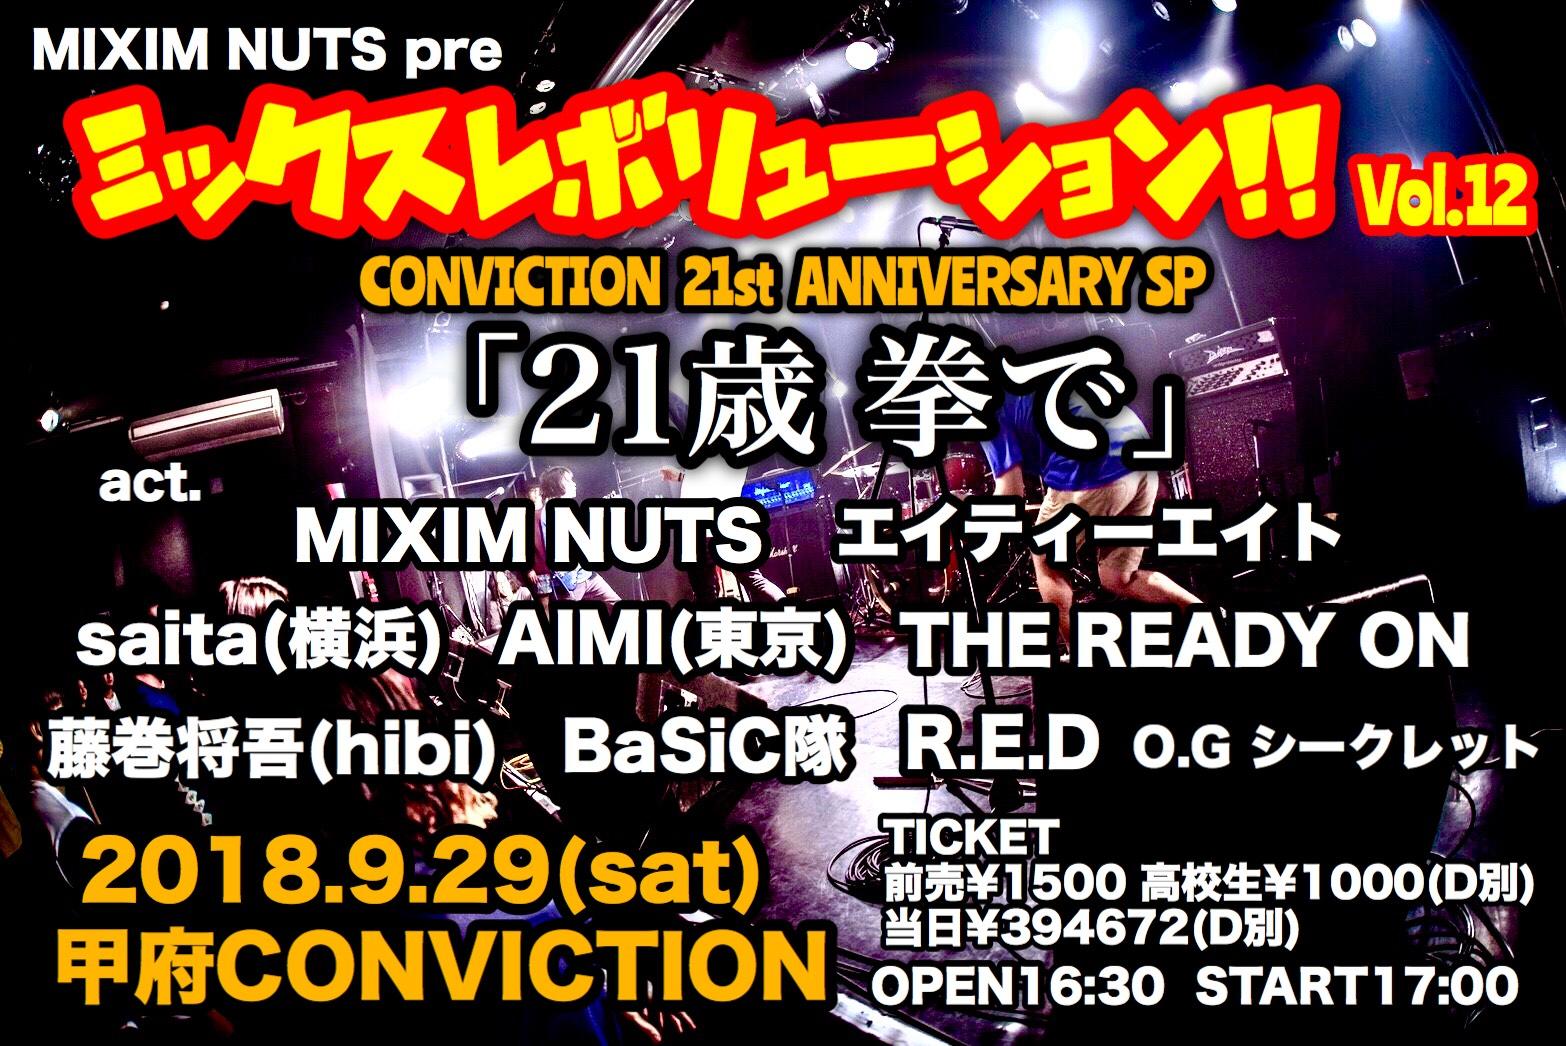 MIXIM NUTS pre. ミックスレボリューション‼Vol.12